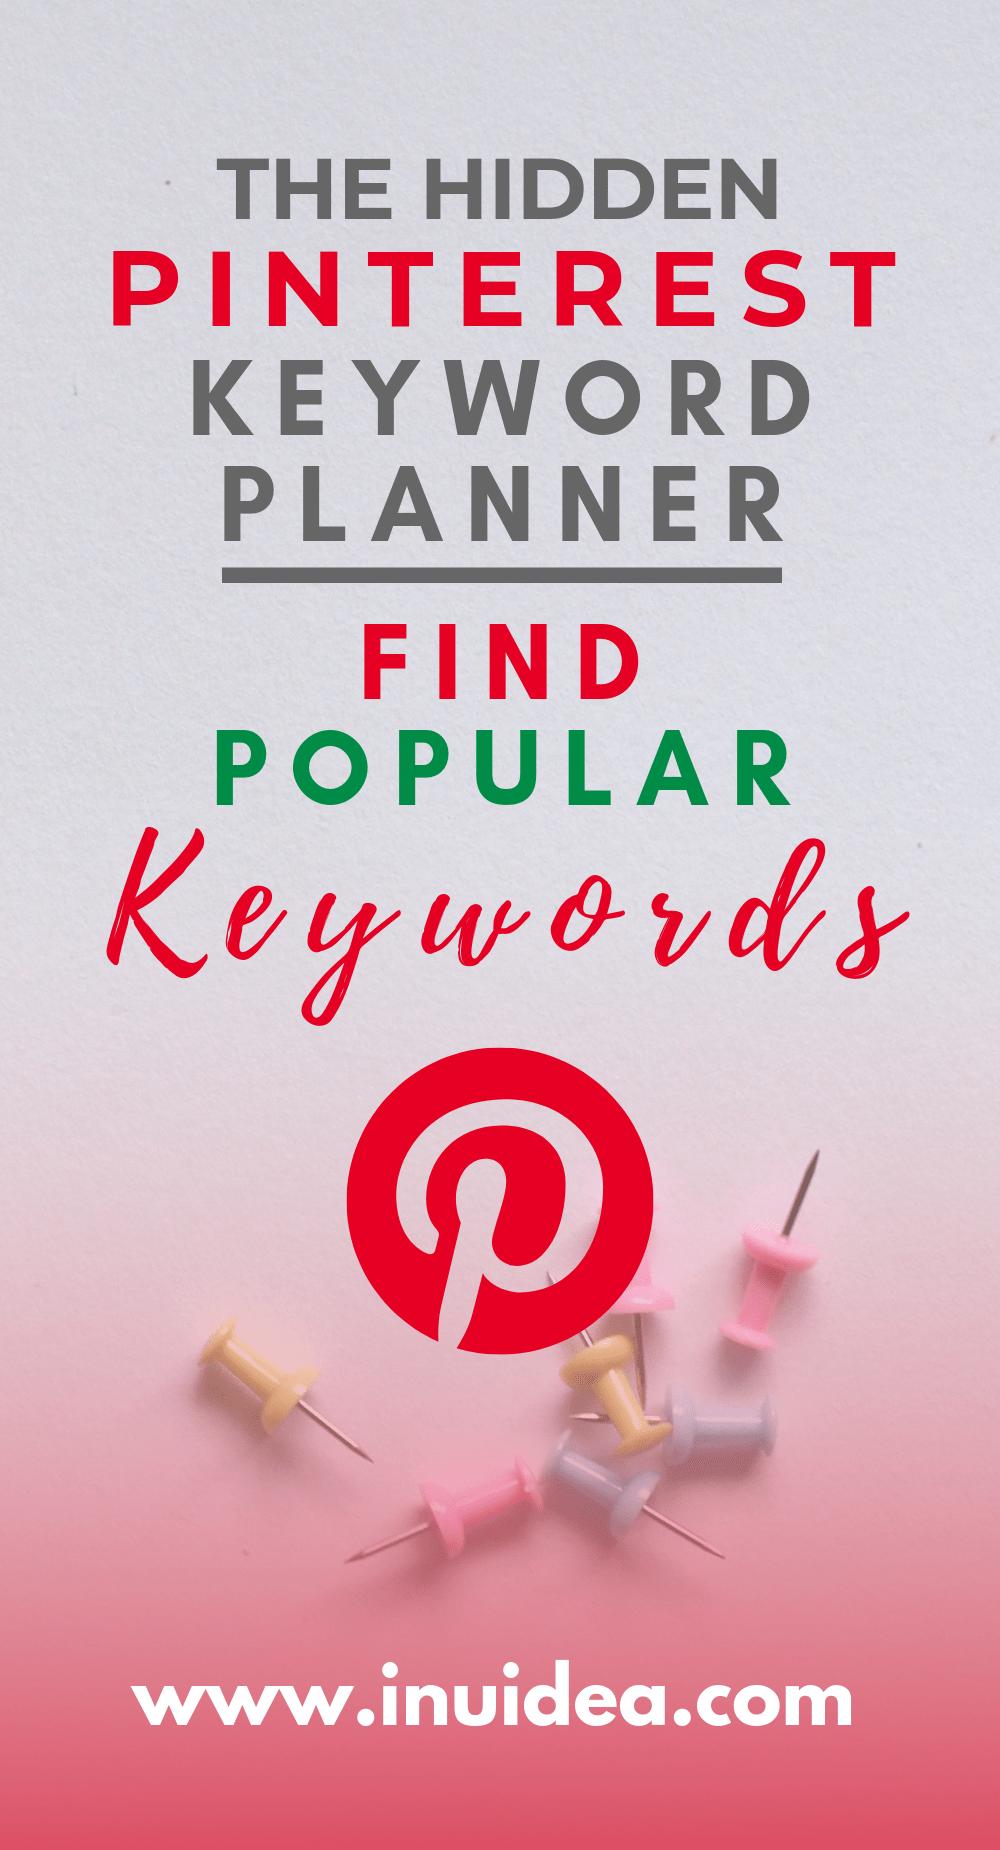 Pinterest Keyword Planner – How To Find Popular Pinterest Keywords